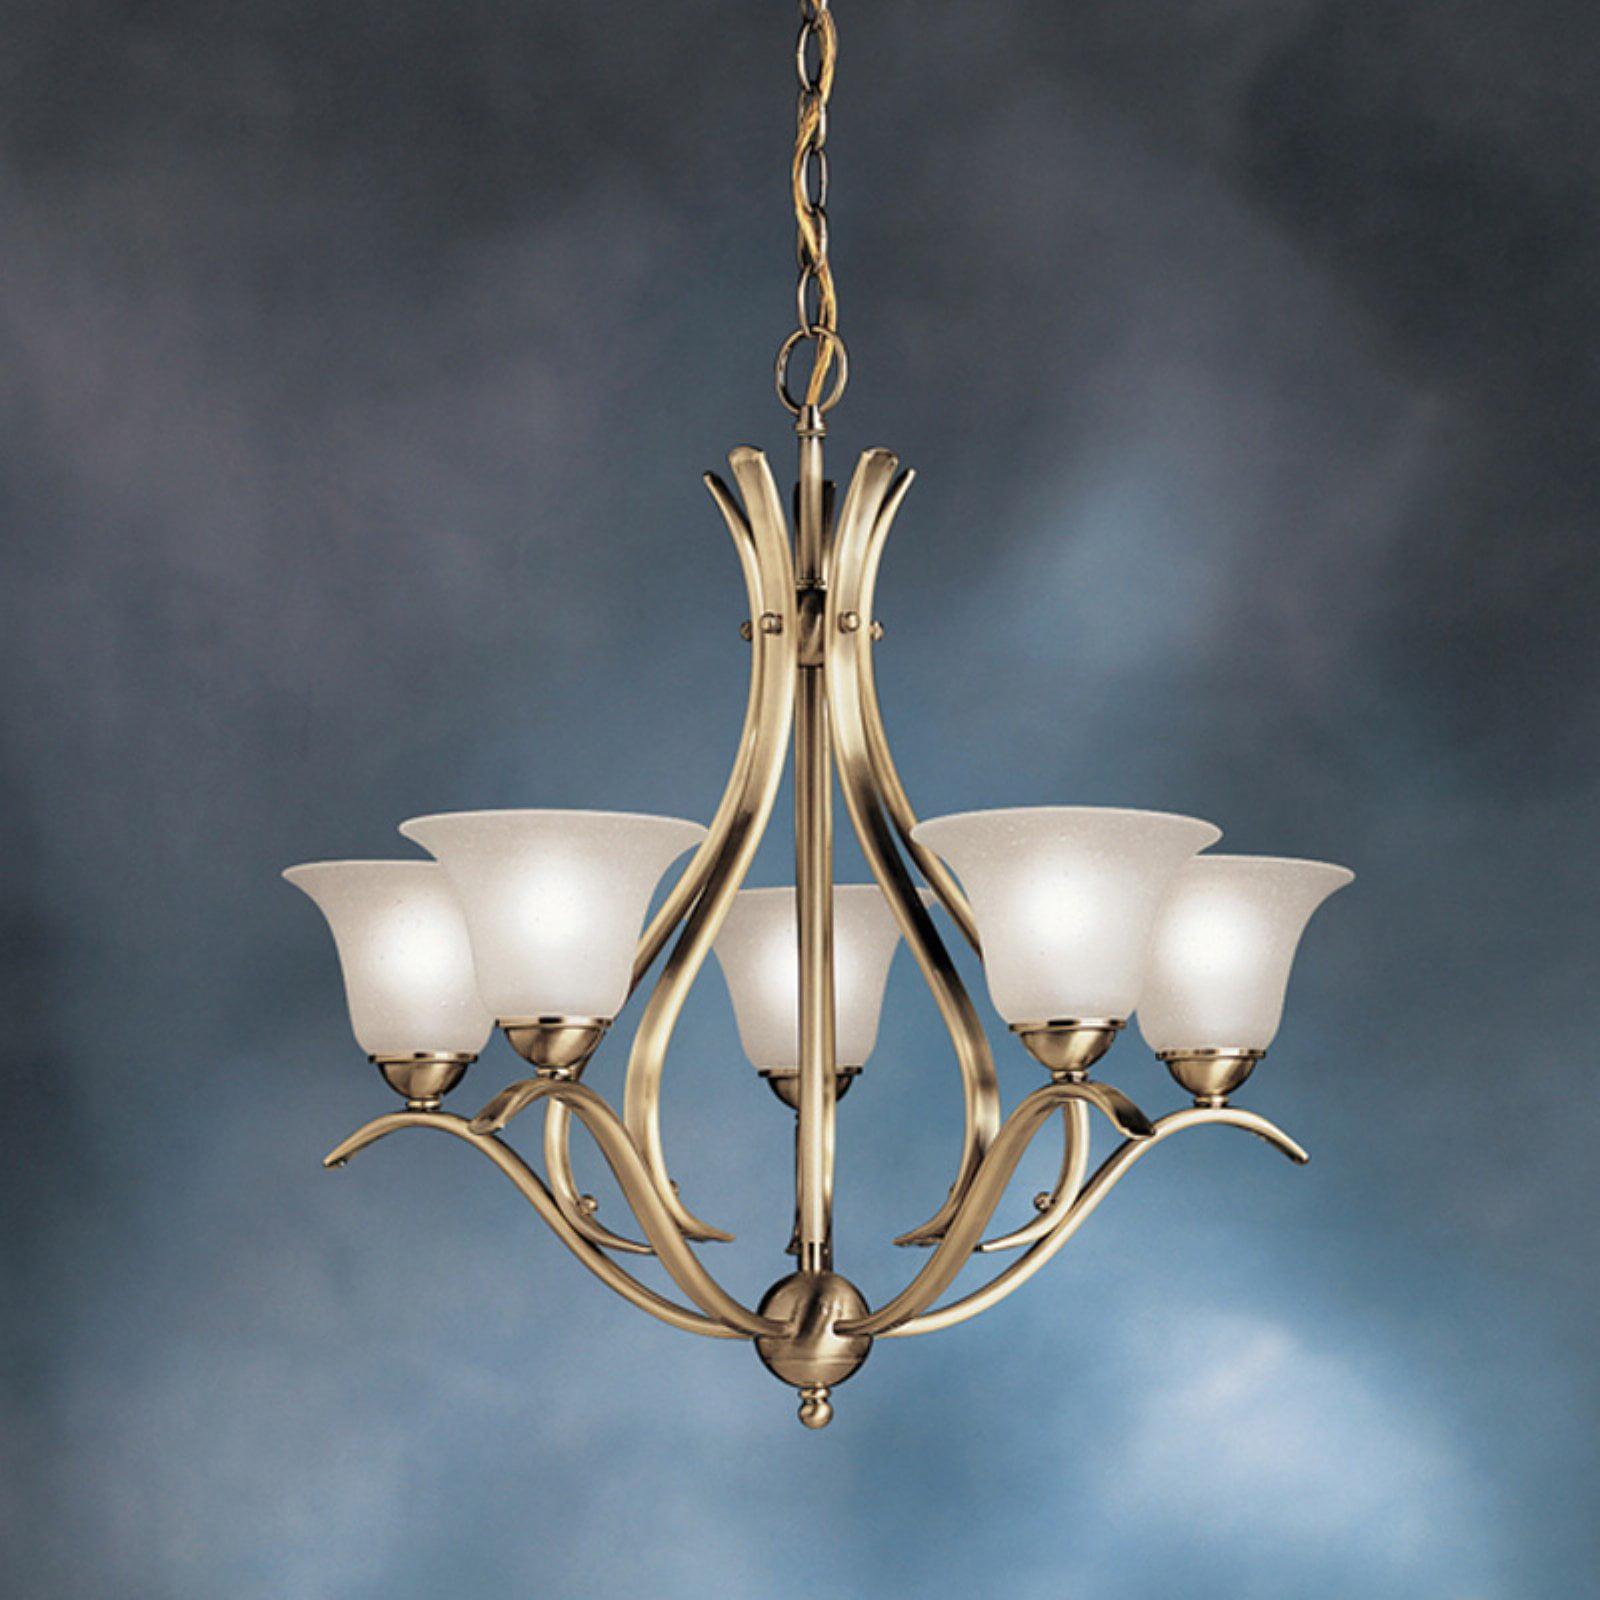 Kichler dover 2020 chandelier walmart arubaitofo Images